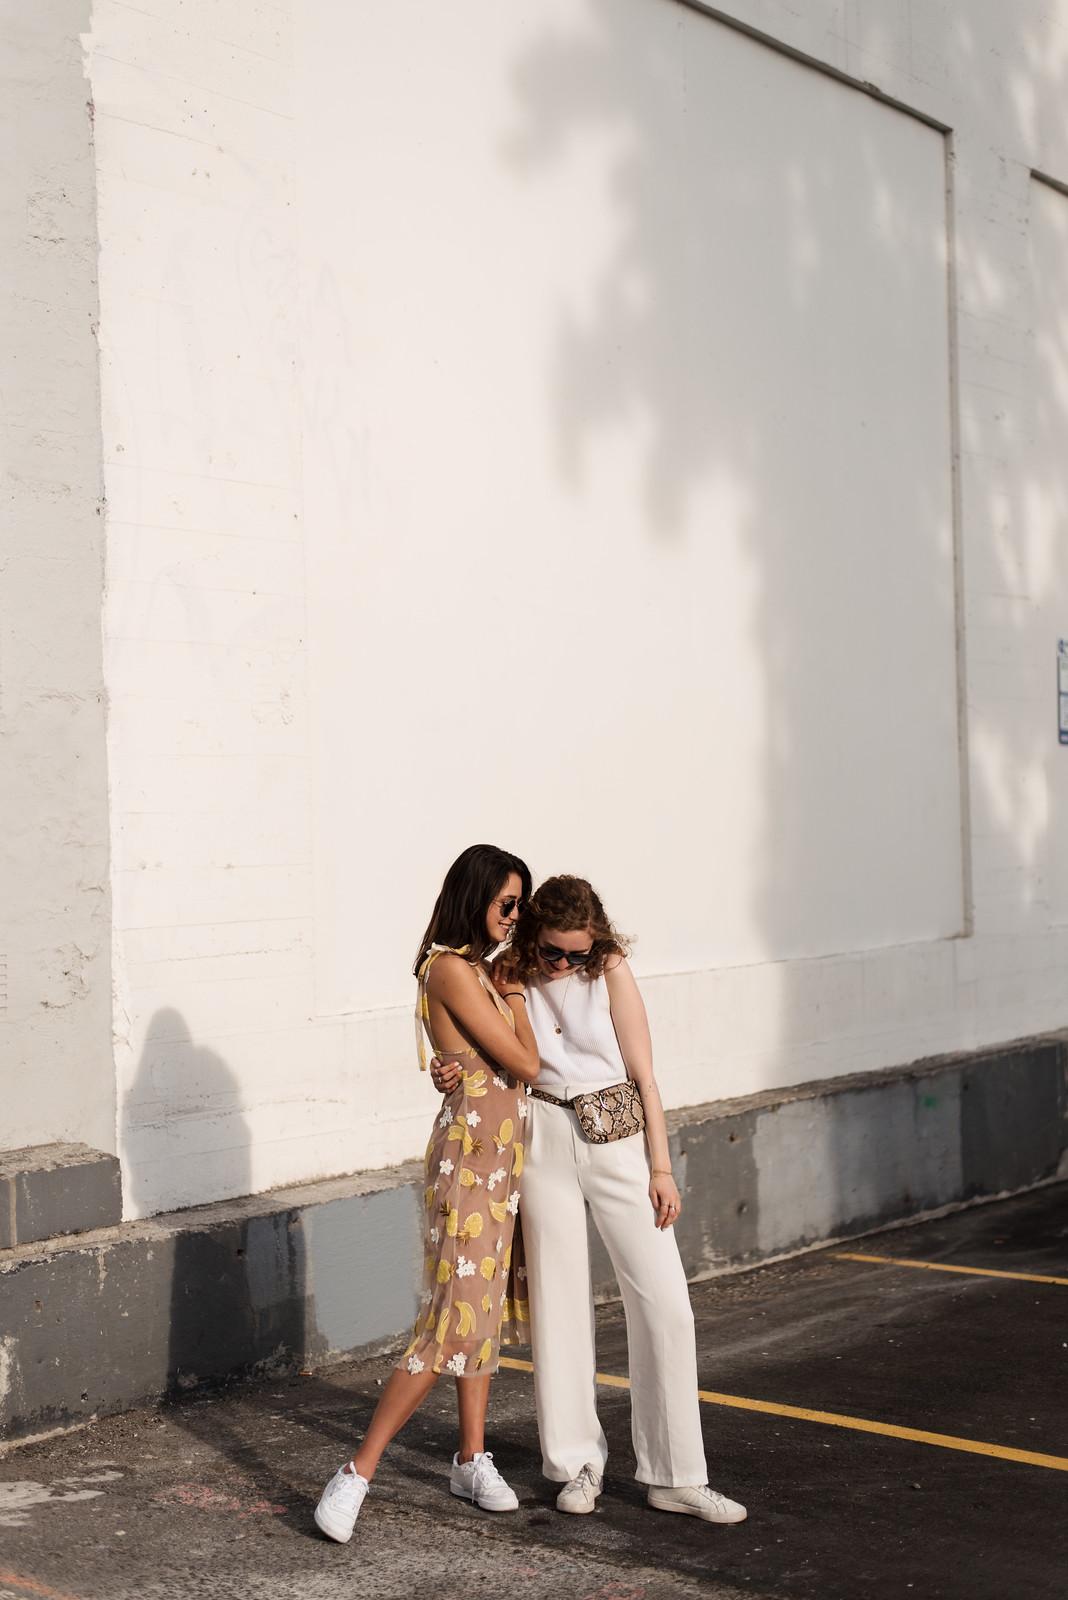 juliettelaura.blogspot.com